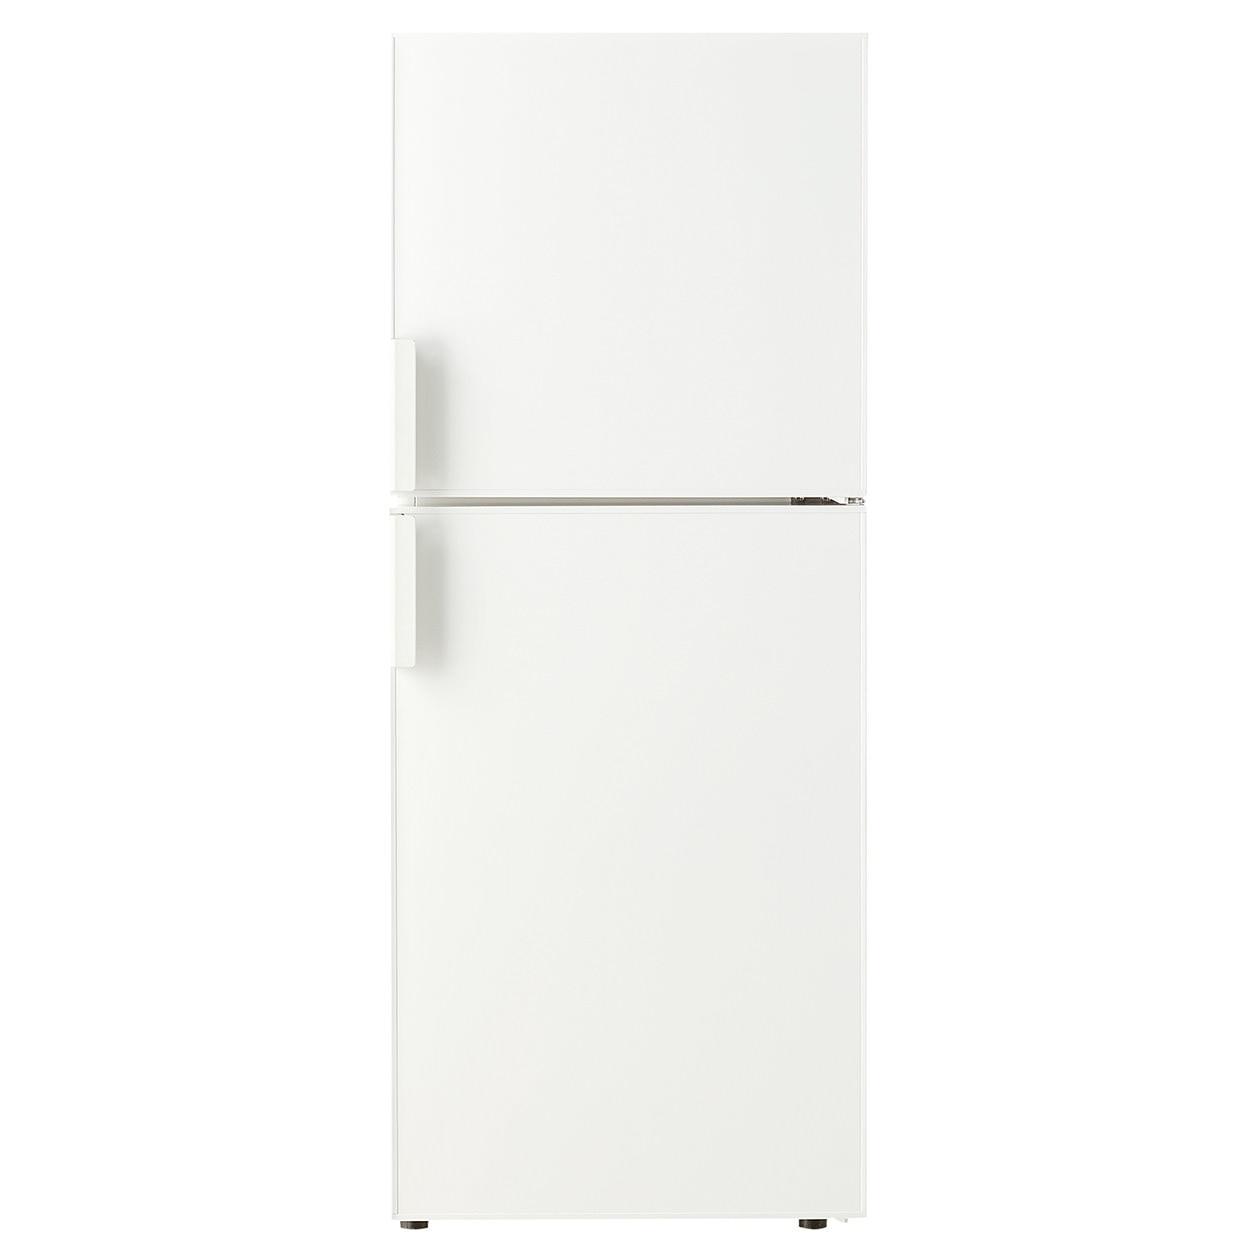 RoomClip商品情報 - 電気冷蔵庫・137L